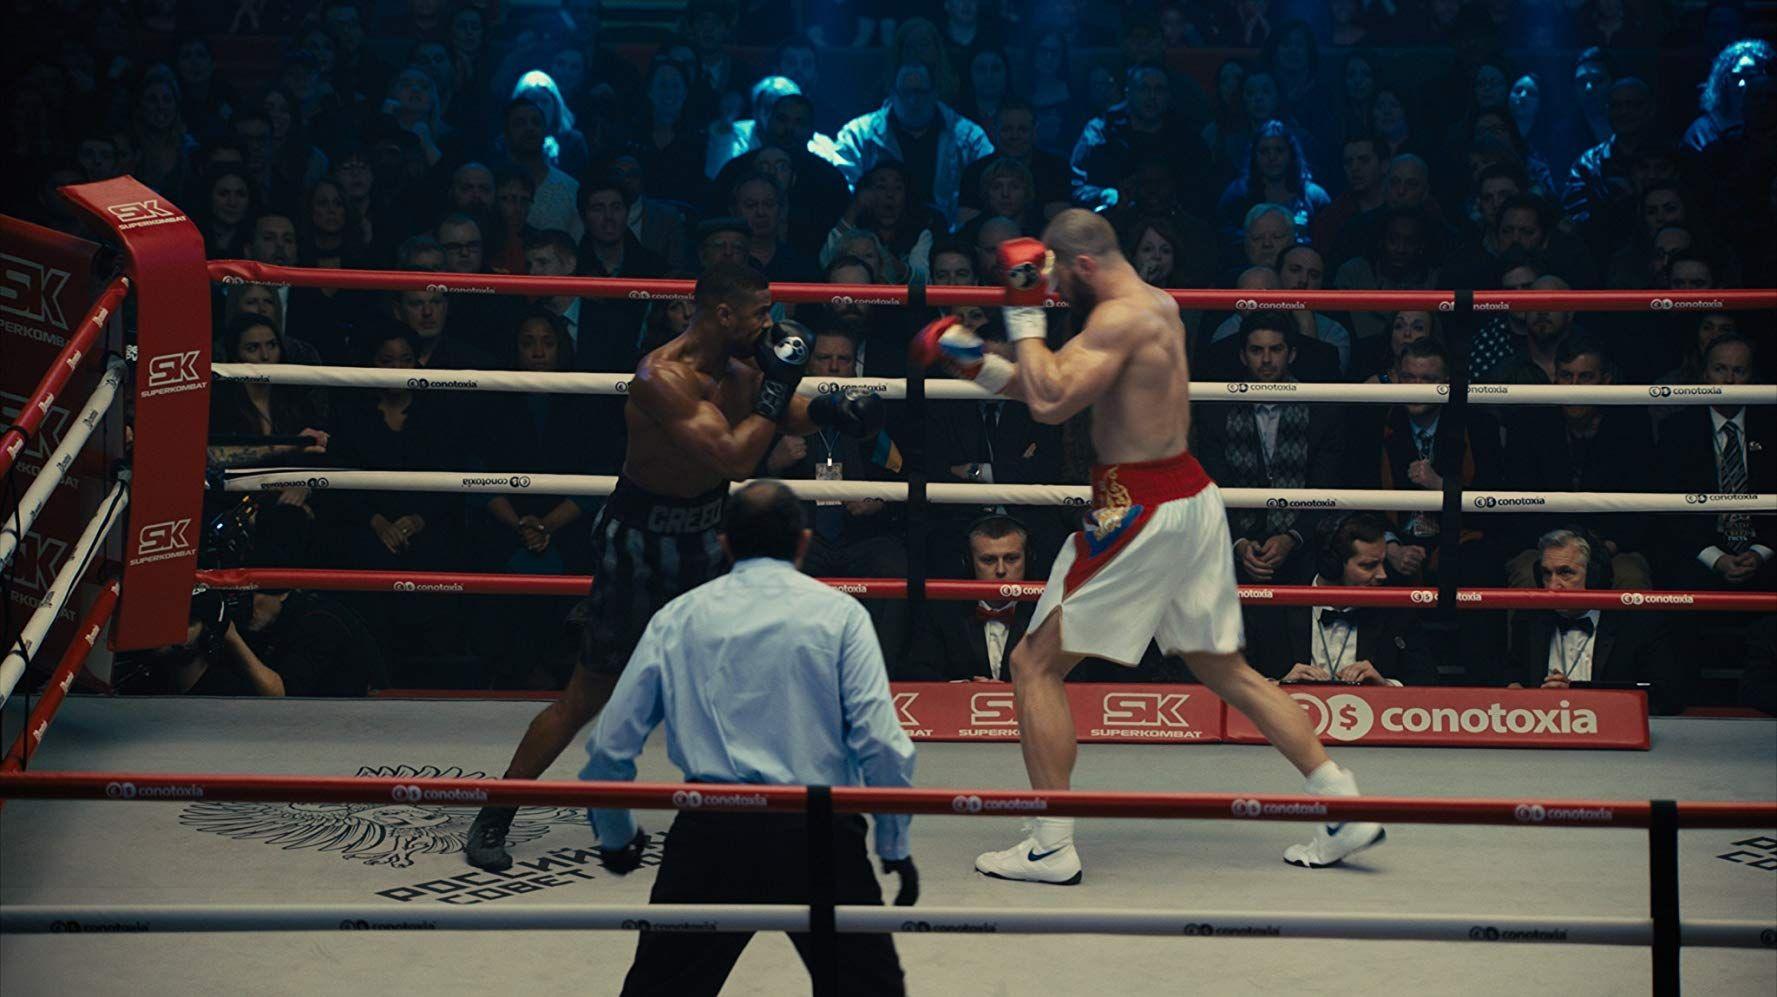 Creed ii 2018 new movies on dvd creed ii 2018 good